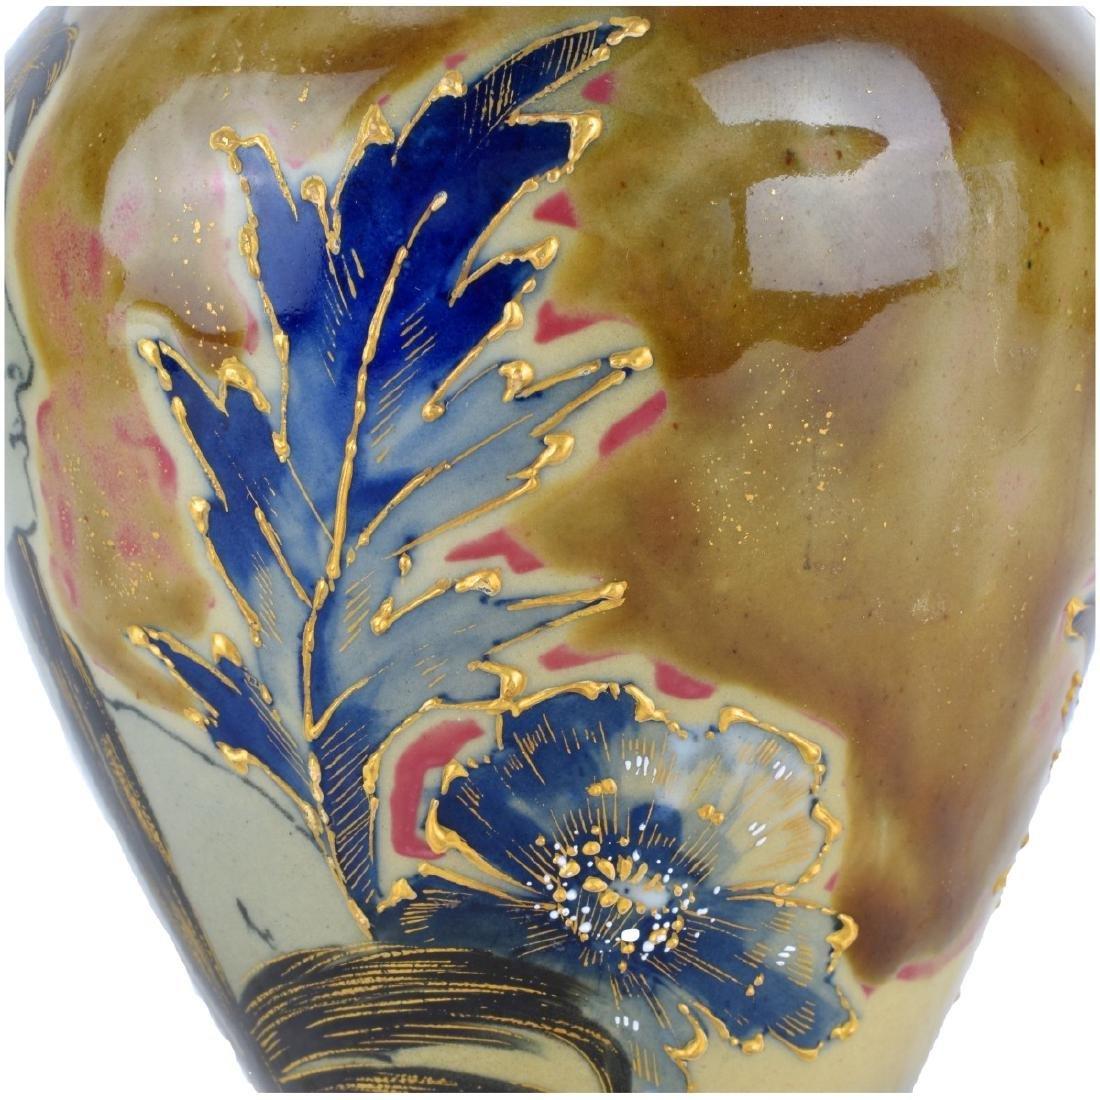 Turn Teplitz Amphora Porcelain Maiden Vase - 4